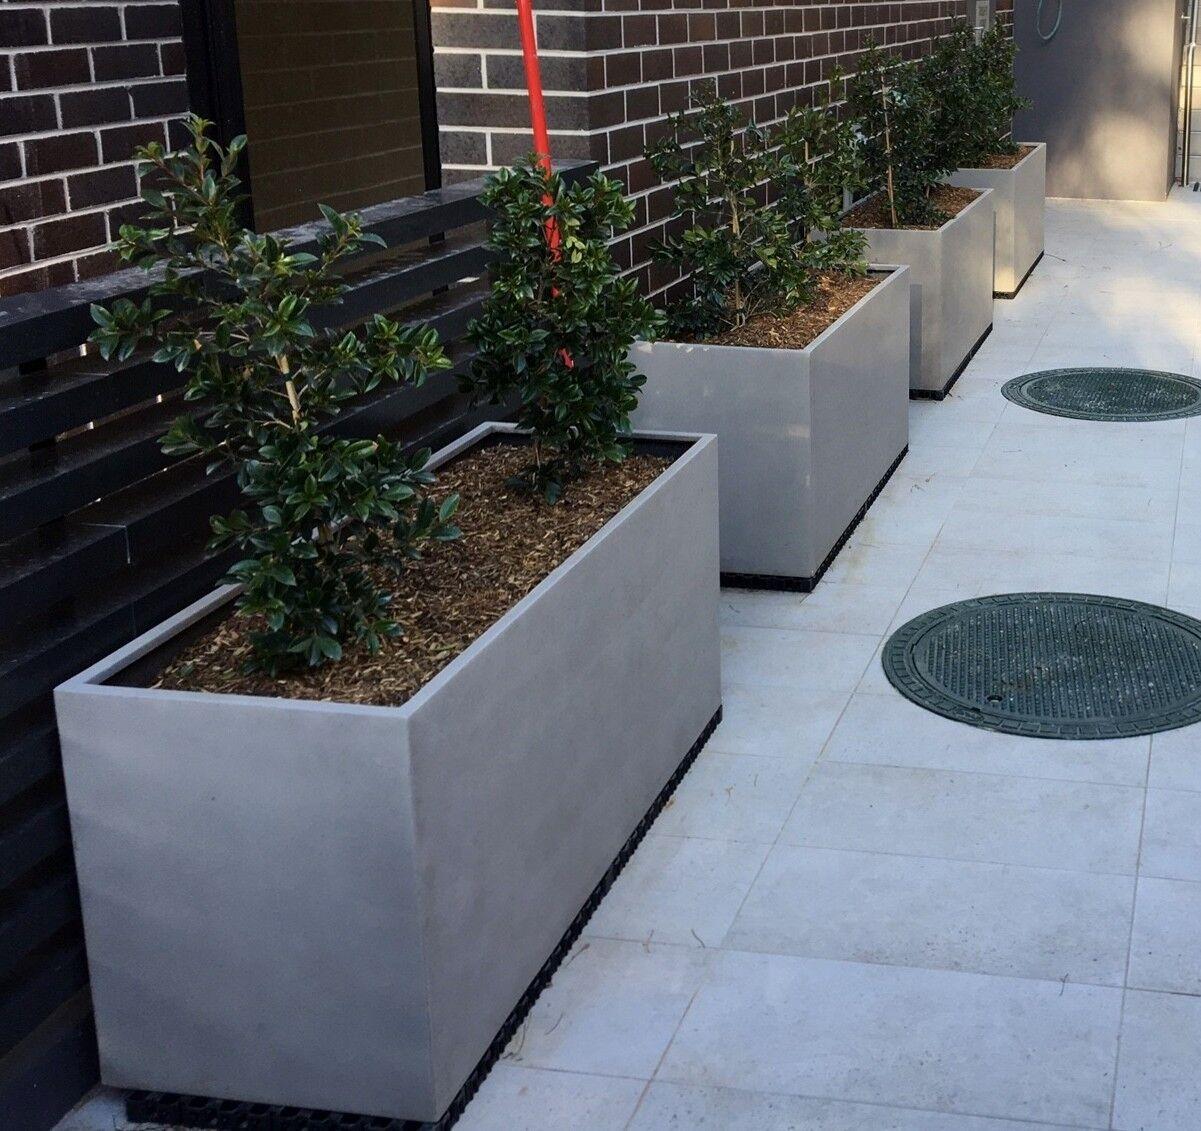 White Outdoor Patio 36 Deluxe Large Garden Planter Flower: Garden Pots: L120xW45xH55 Long Ultra Lite Weight Concrete